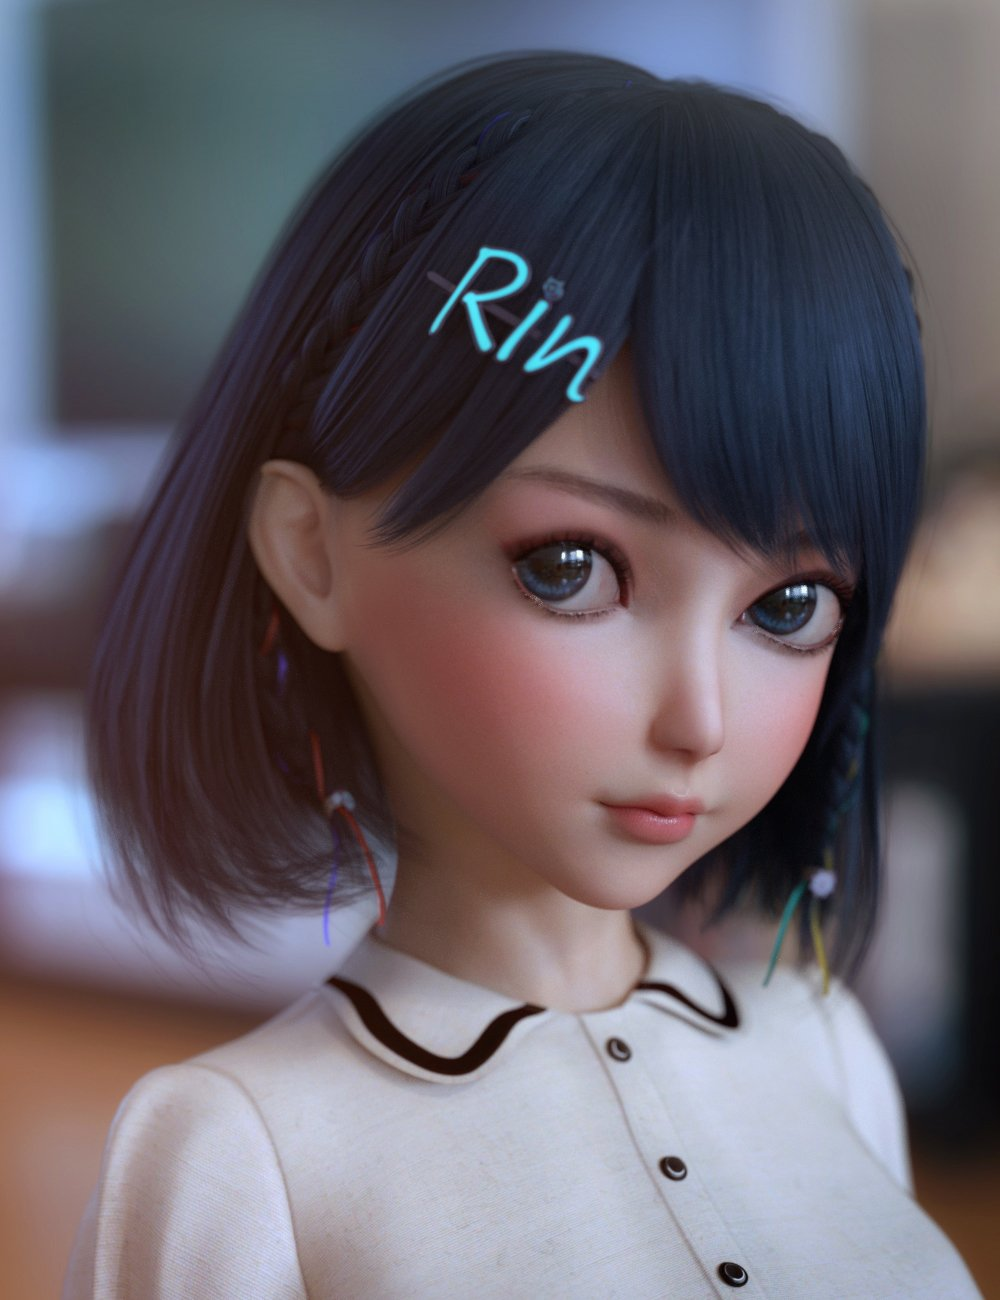 Rin Hair for Genesis 8 Females by: Crocodile Liu, 3D Models by Daz 3D